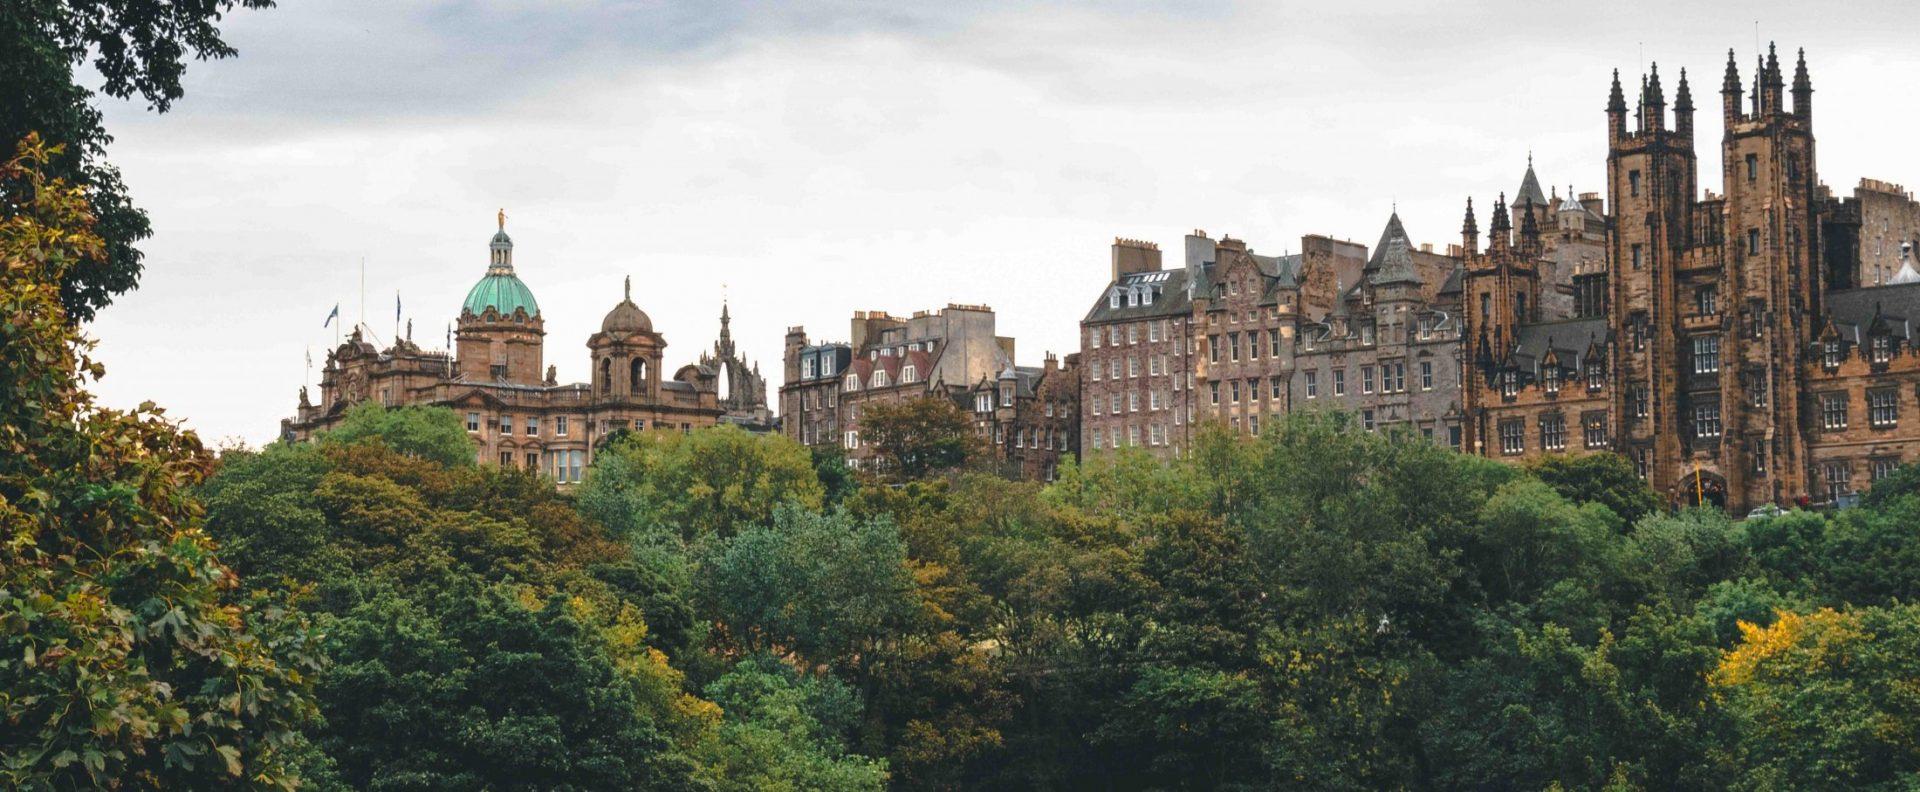 The Old Waverley Hotel Offers | Edinburgh City Centre Accommodation